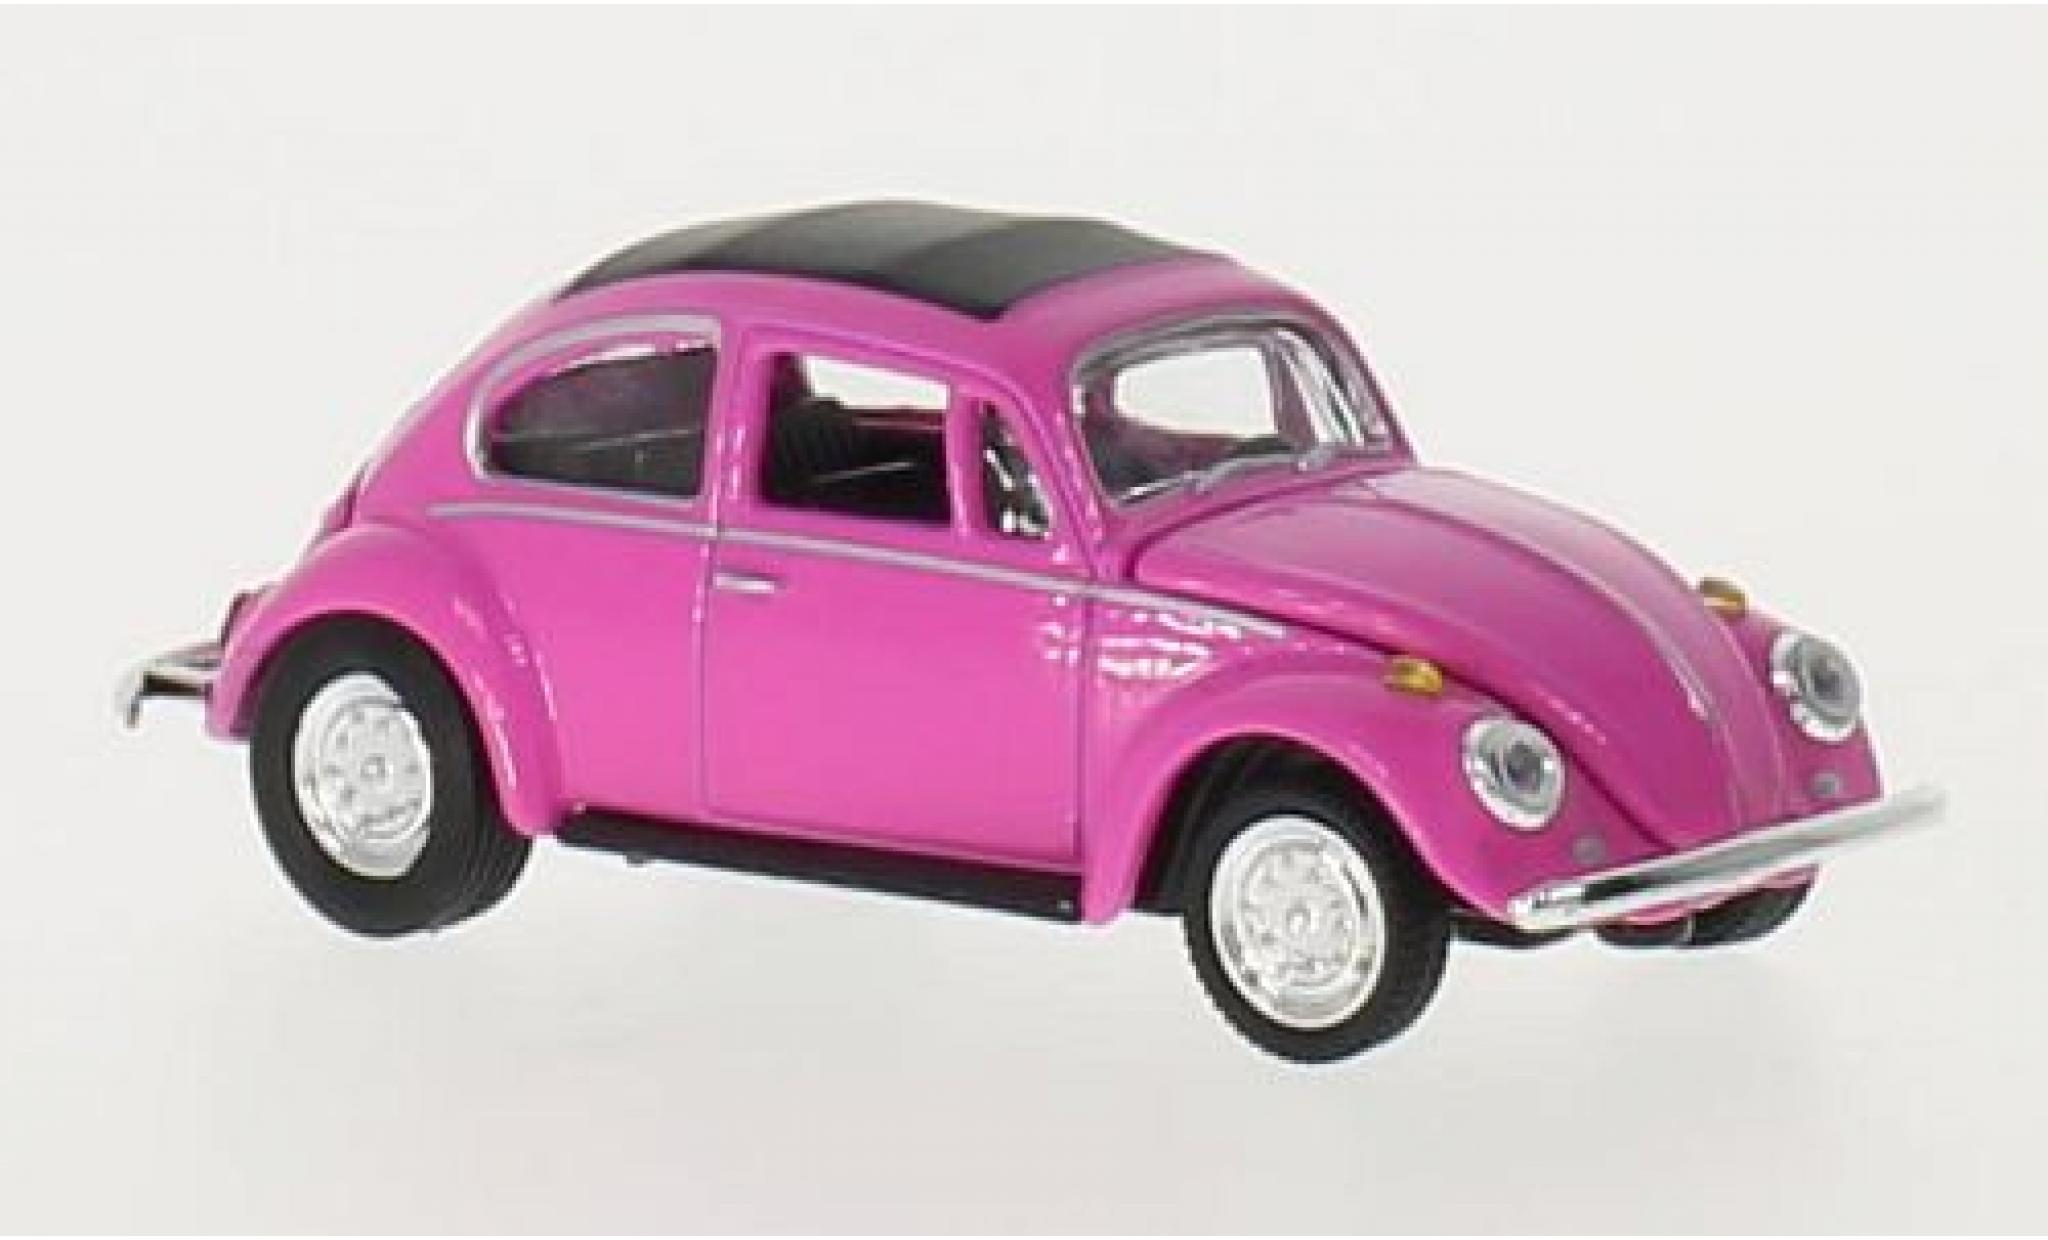 Volkswagen Beetle 1/64 M2 Machines Deluxe rose U.S.A.Model 1967 grisene jantes